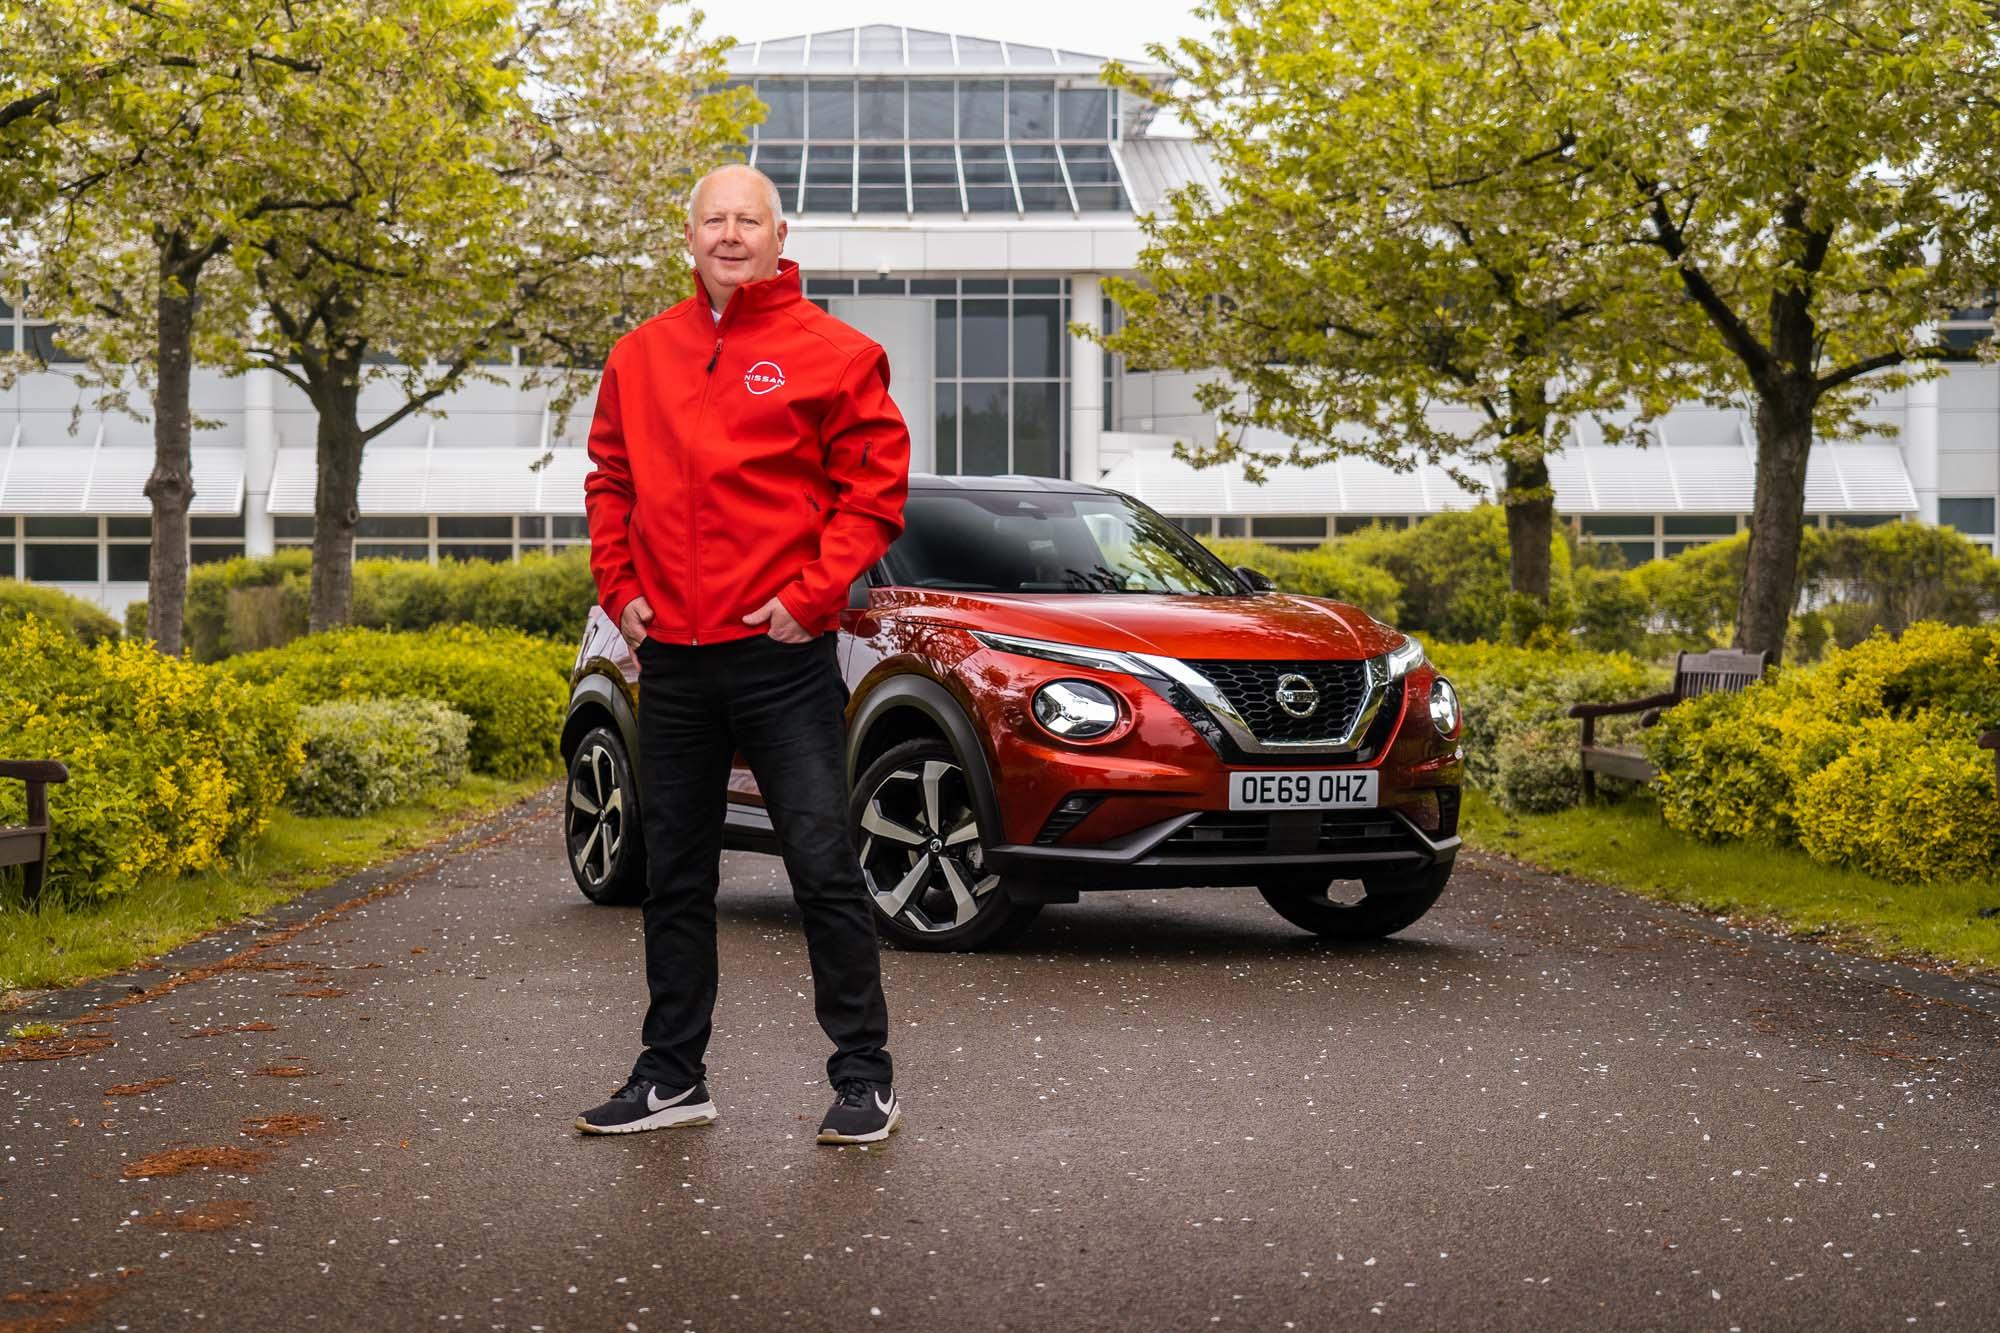 JUKE Masterclass Paul Eames 4 Ο κορυφαίος εκπαιδευτής οδήγησης της Nissan, προσφέρει masterclass οδήγησης με το JUKE Nissan, Nissan Juke, zblog, ειδήσεις, Νέα